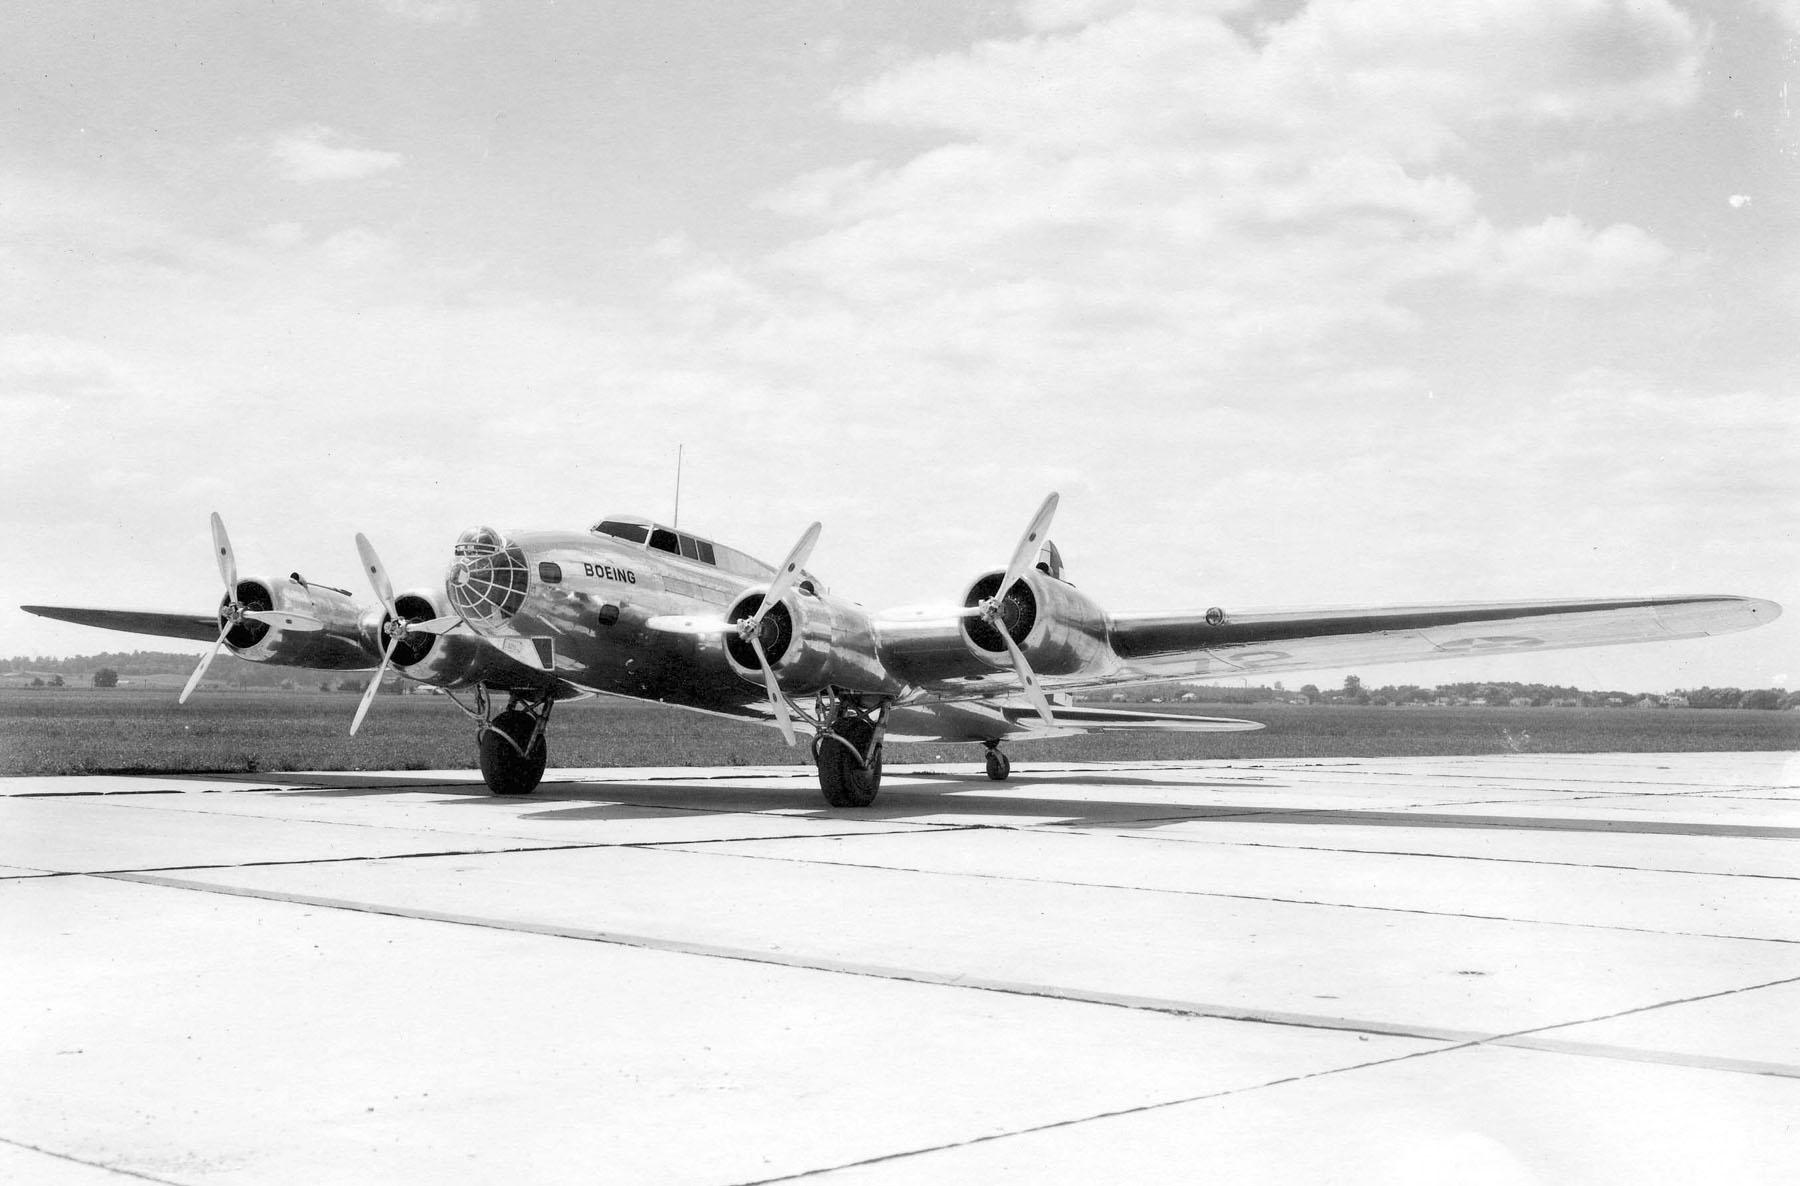 B-17 #Model 299 (XB-17) – NX13372